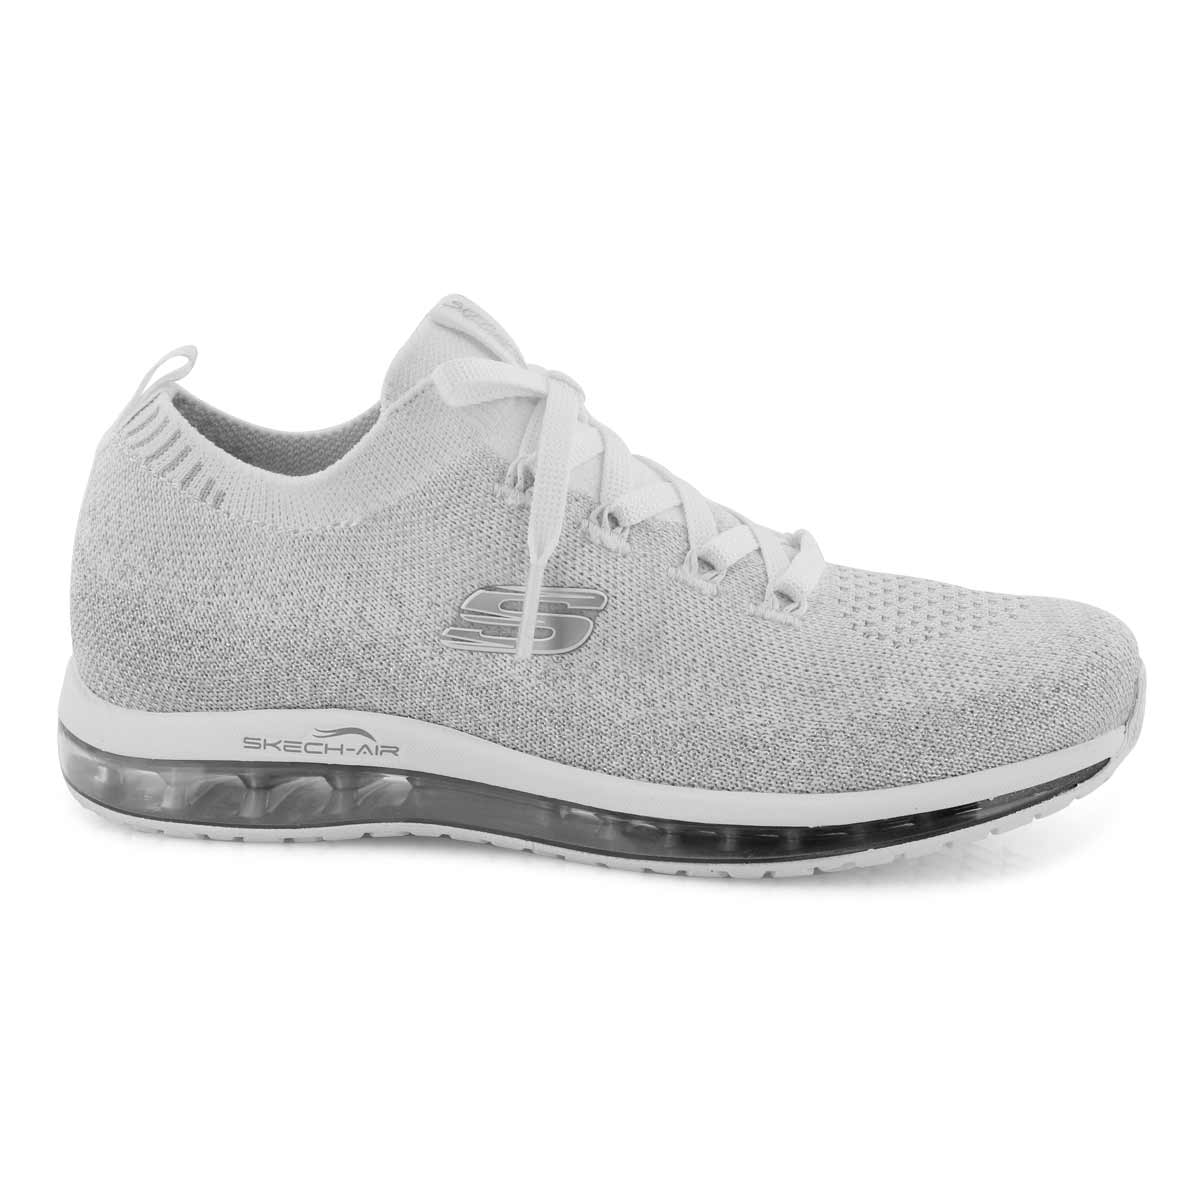 Lds Skech-Air Element wht/silver sneaker